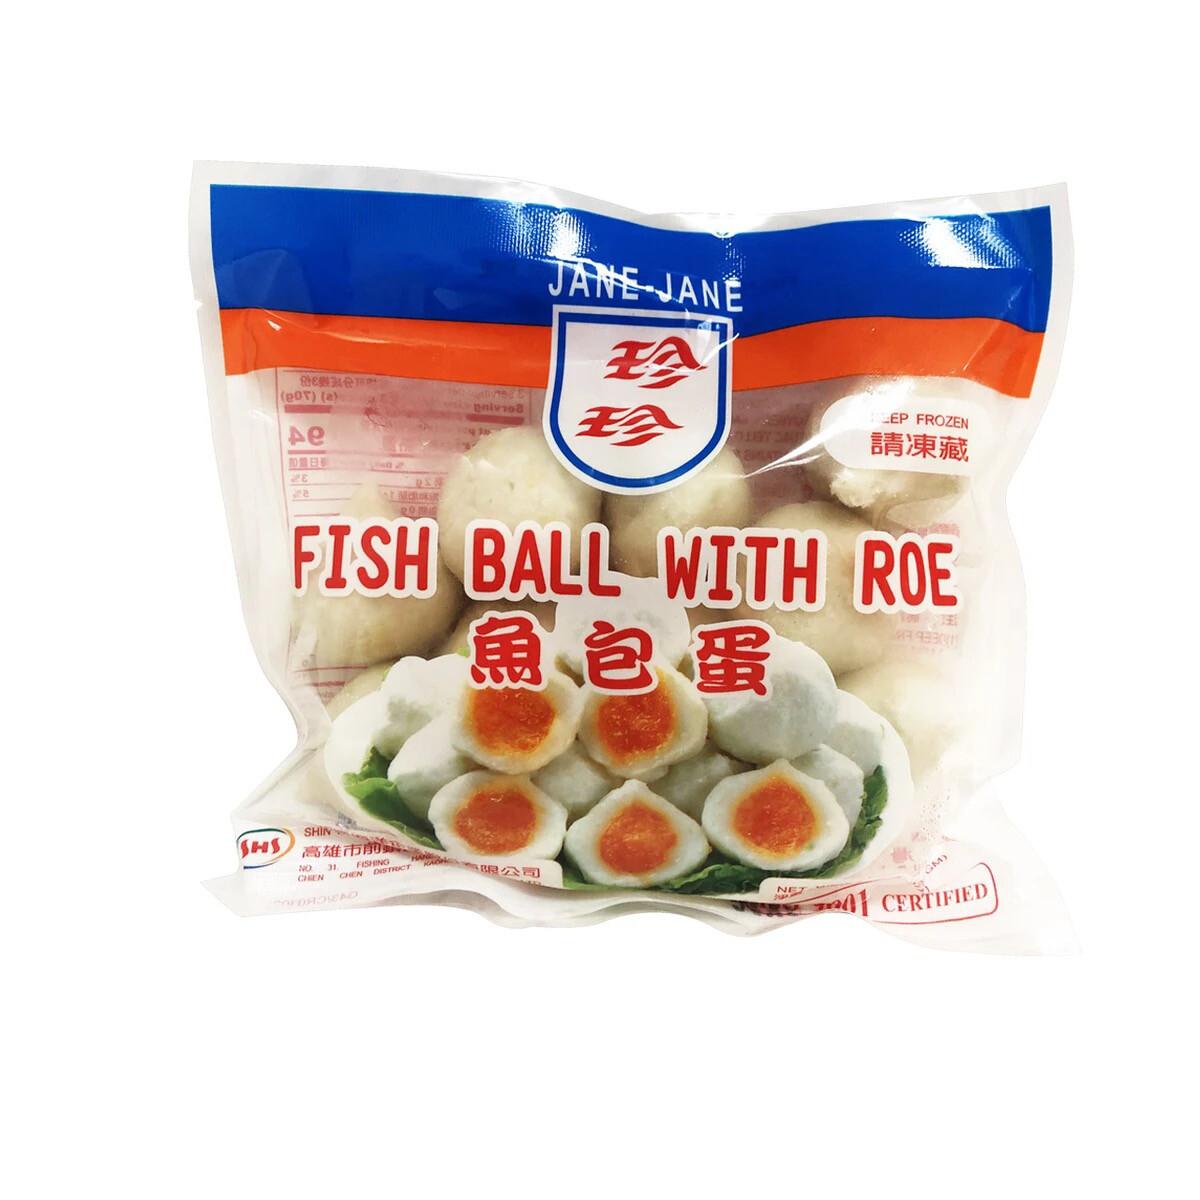 【RBF】Fish Ball With Roe 珍珍鱼包蛋 8oz